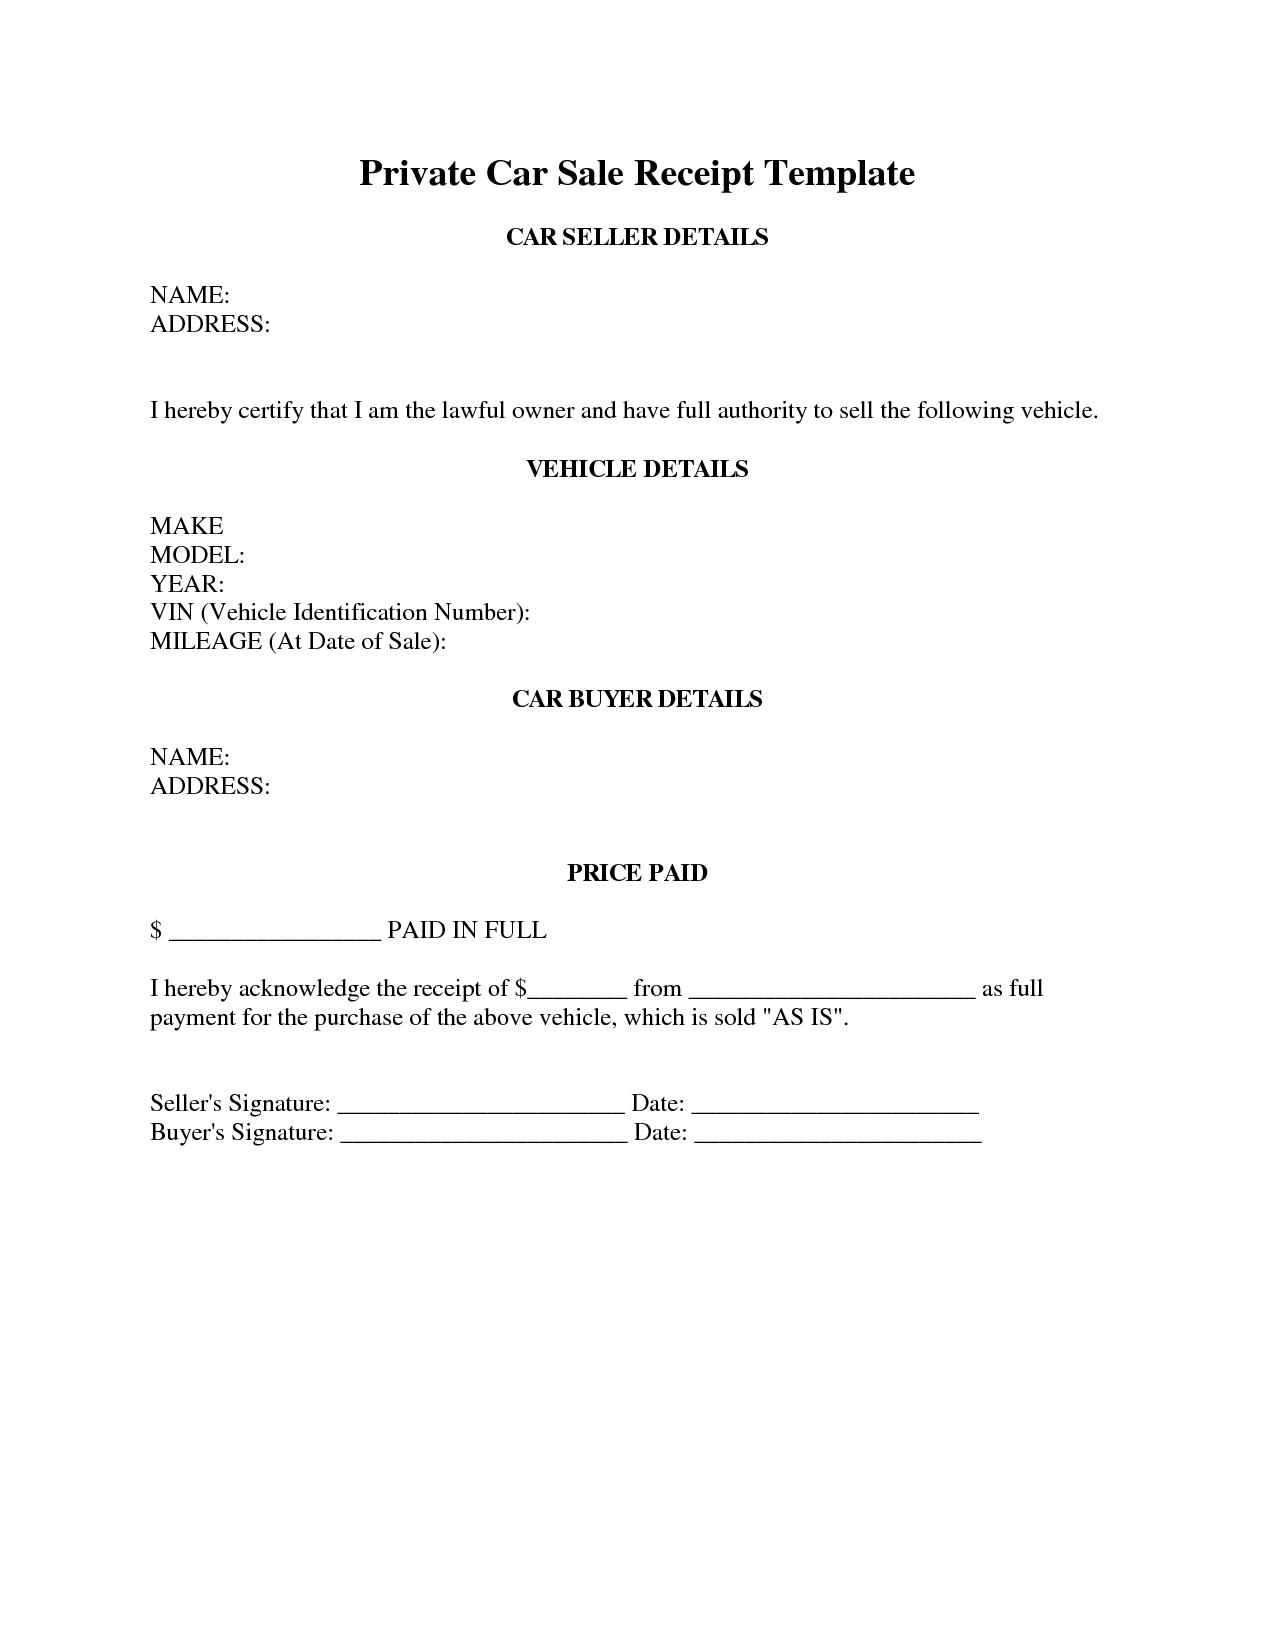 Car Sale Receipt Template | Random | Receipt Template, Sales - Free Printable Sales Receipt Form